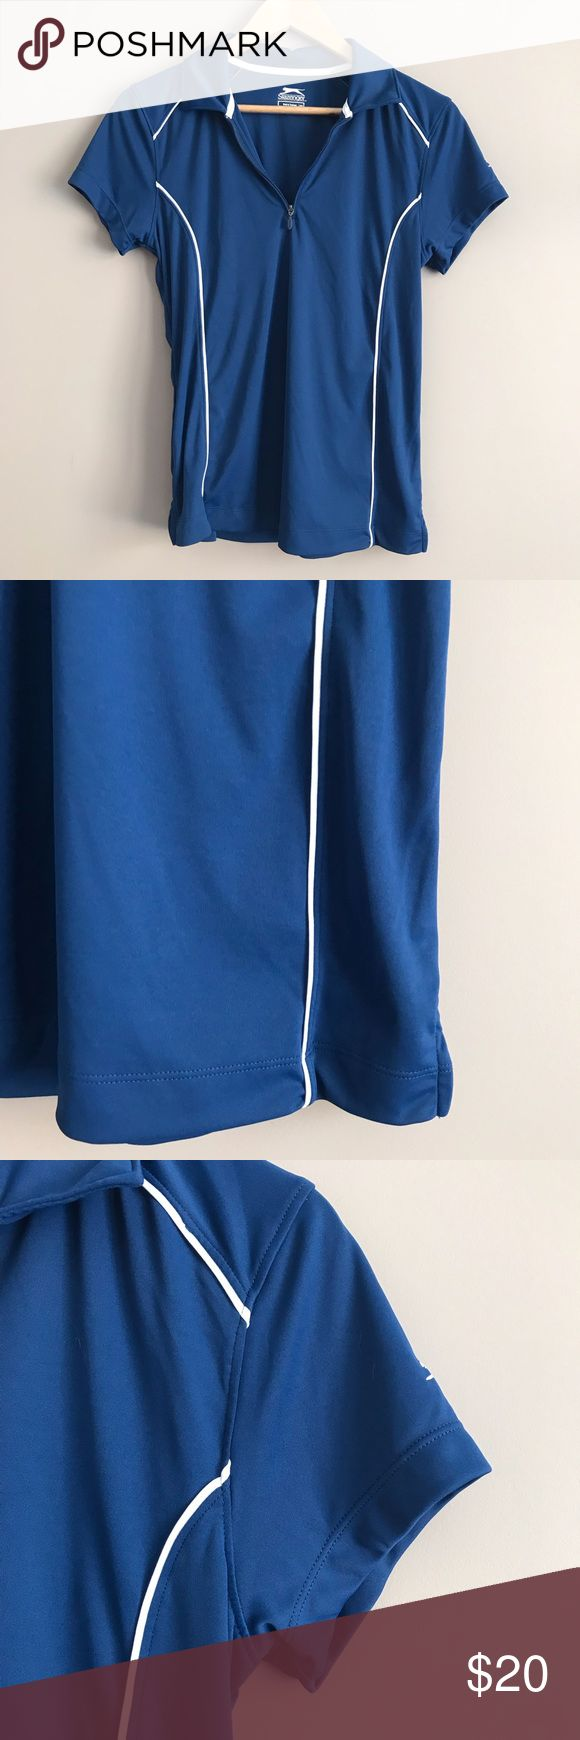 Slazenger Women's Gold Tee - Dark Blue Perfect condition, will bundle with orange slazenger top for $30 Slazenger Tops